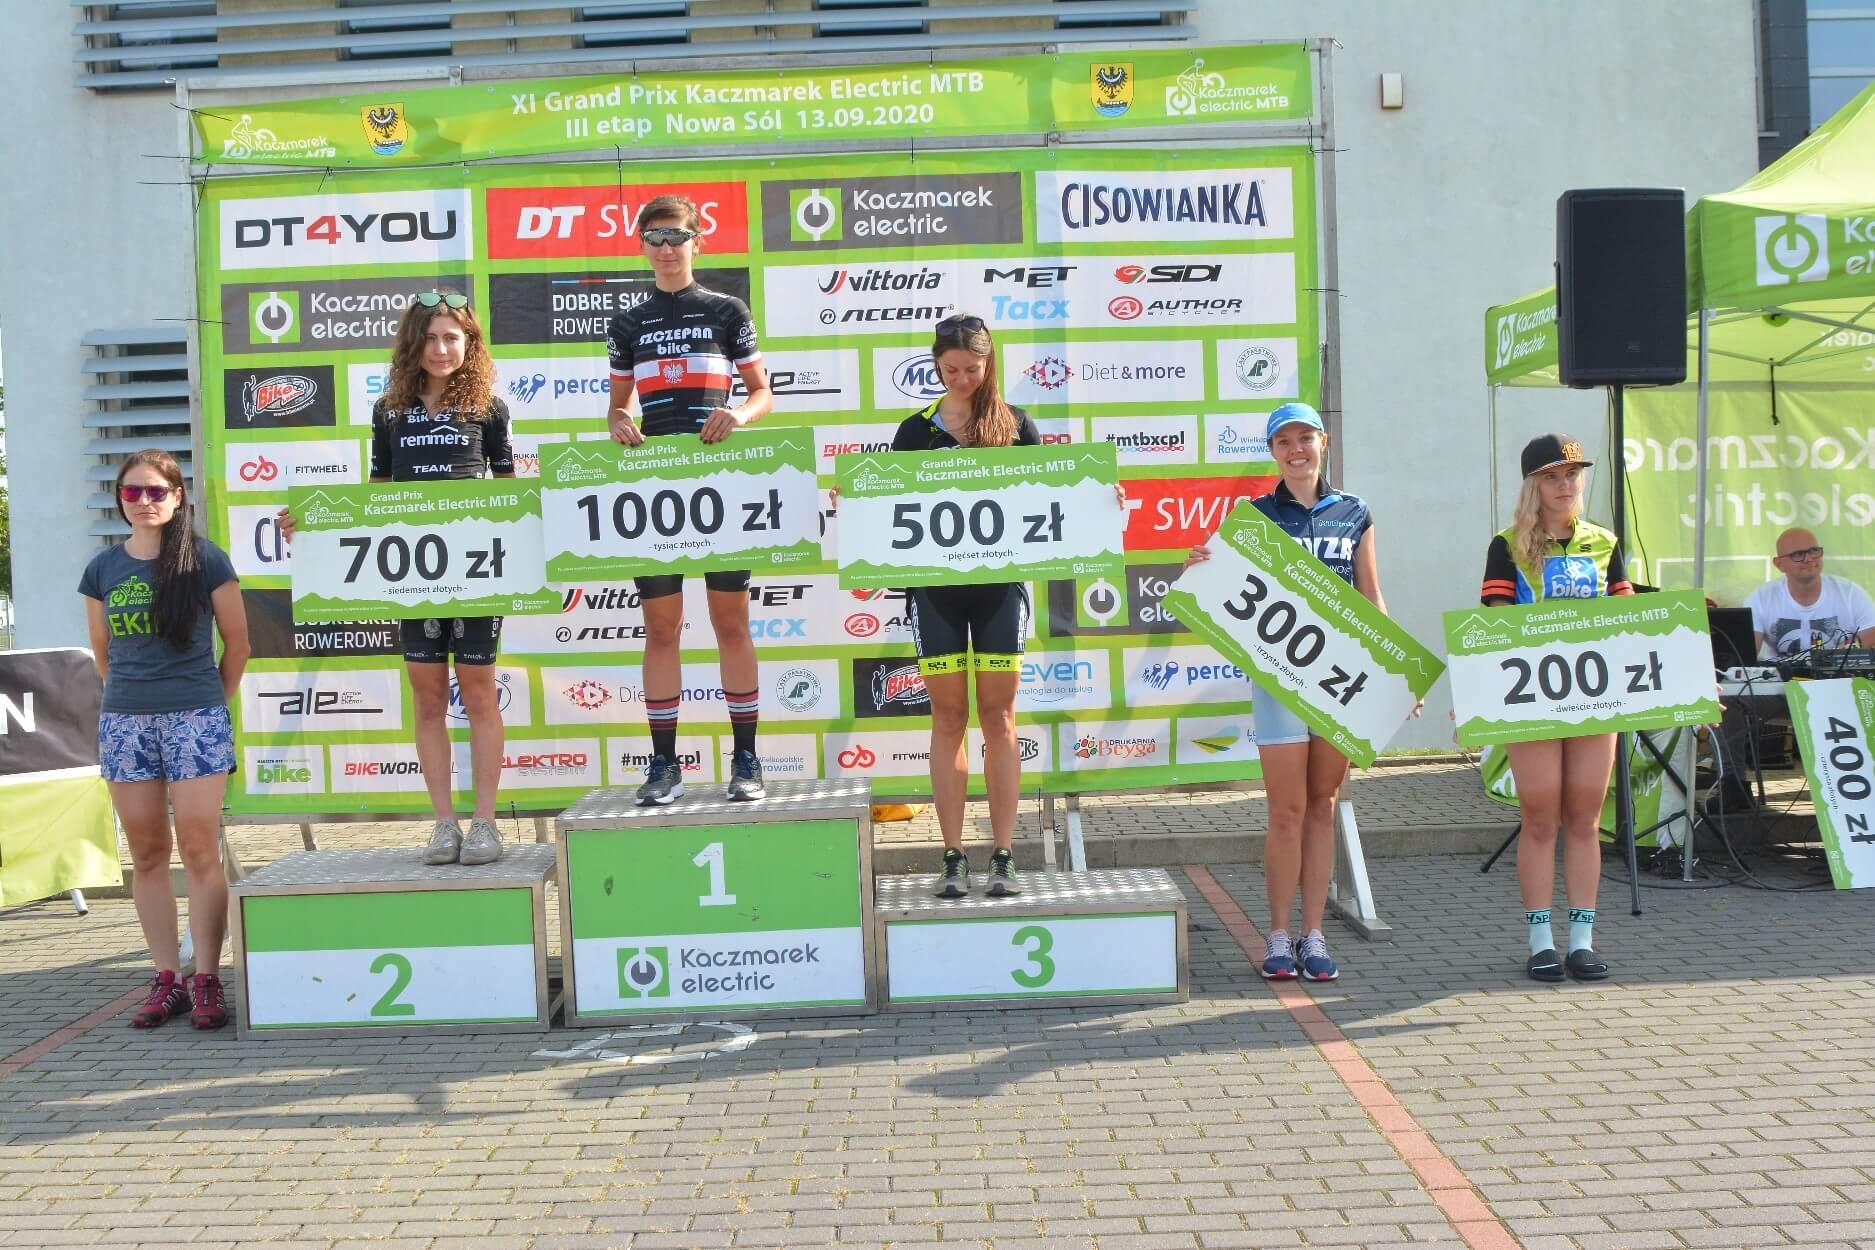 III etap Grand Prix Kaczmarek Electric MTB 2020 - Nowa Sól